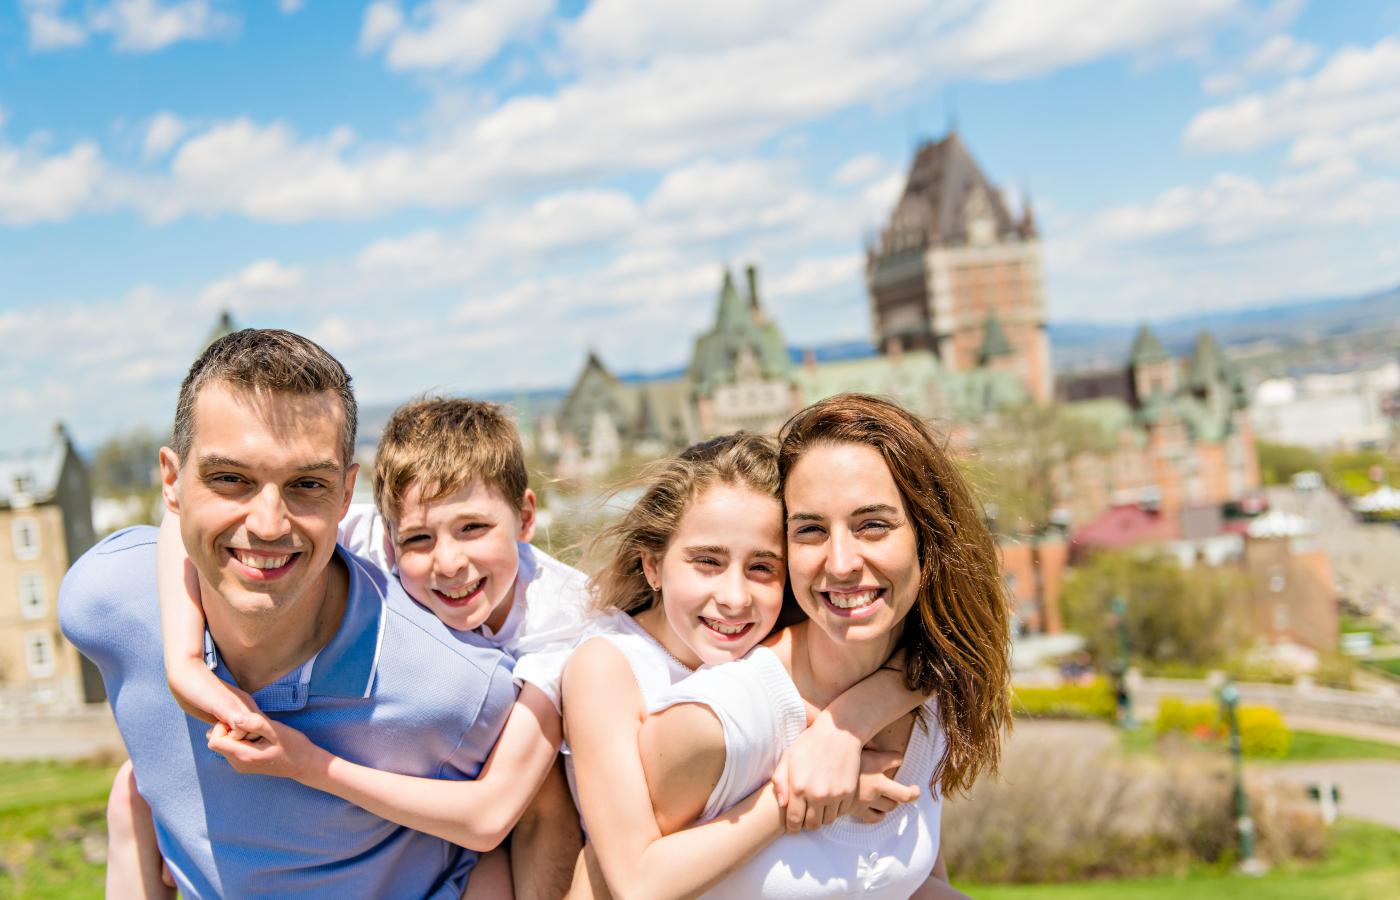 Ostkanada Family kompakt